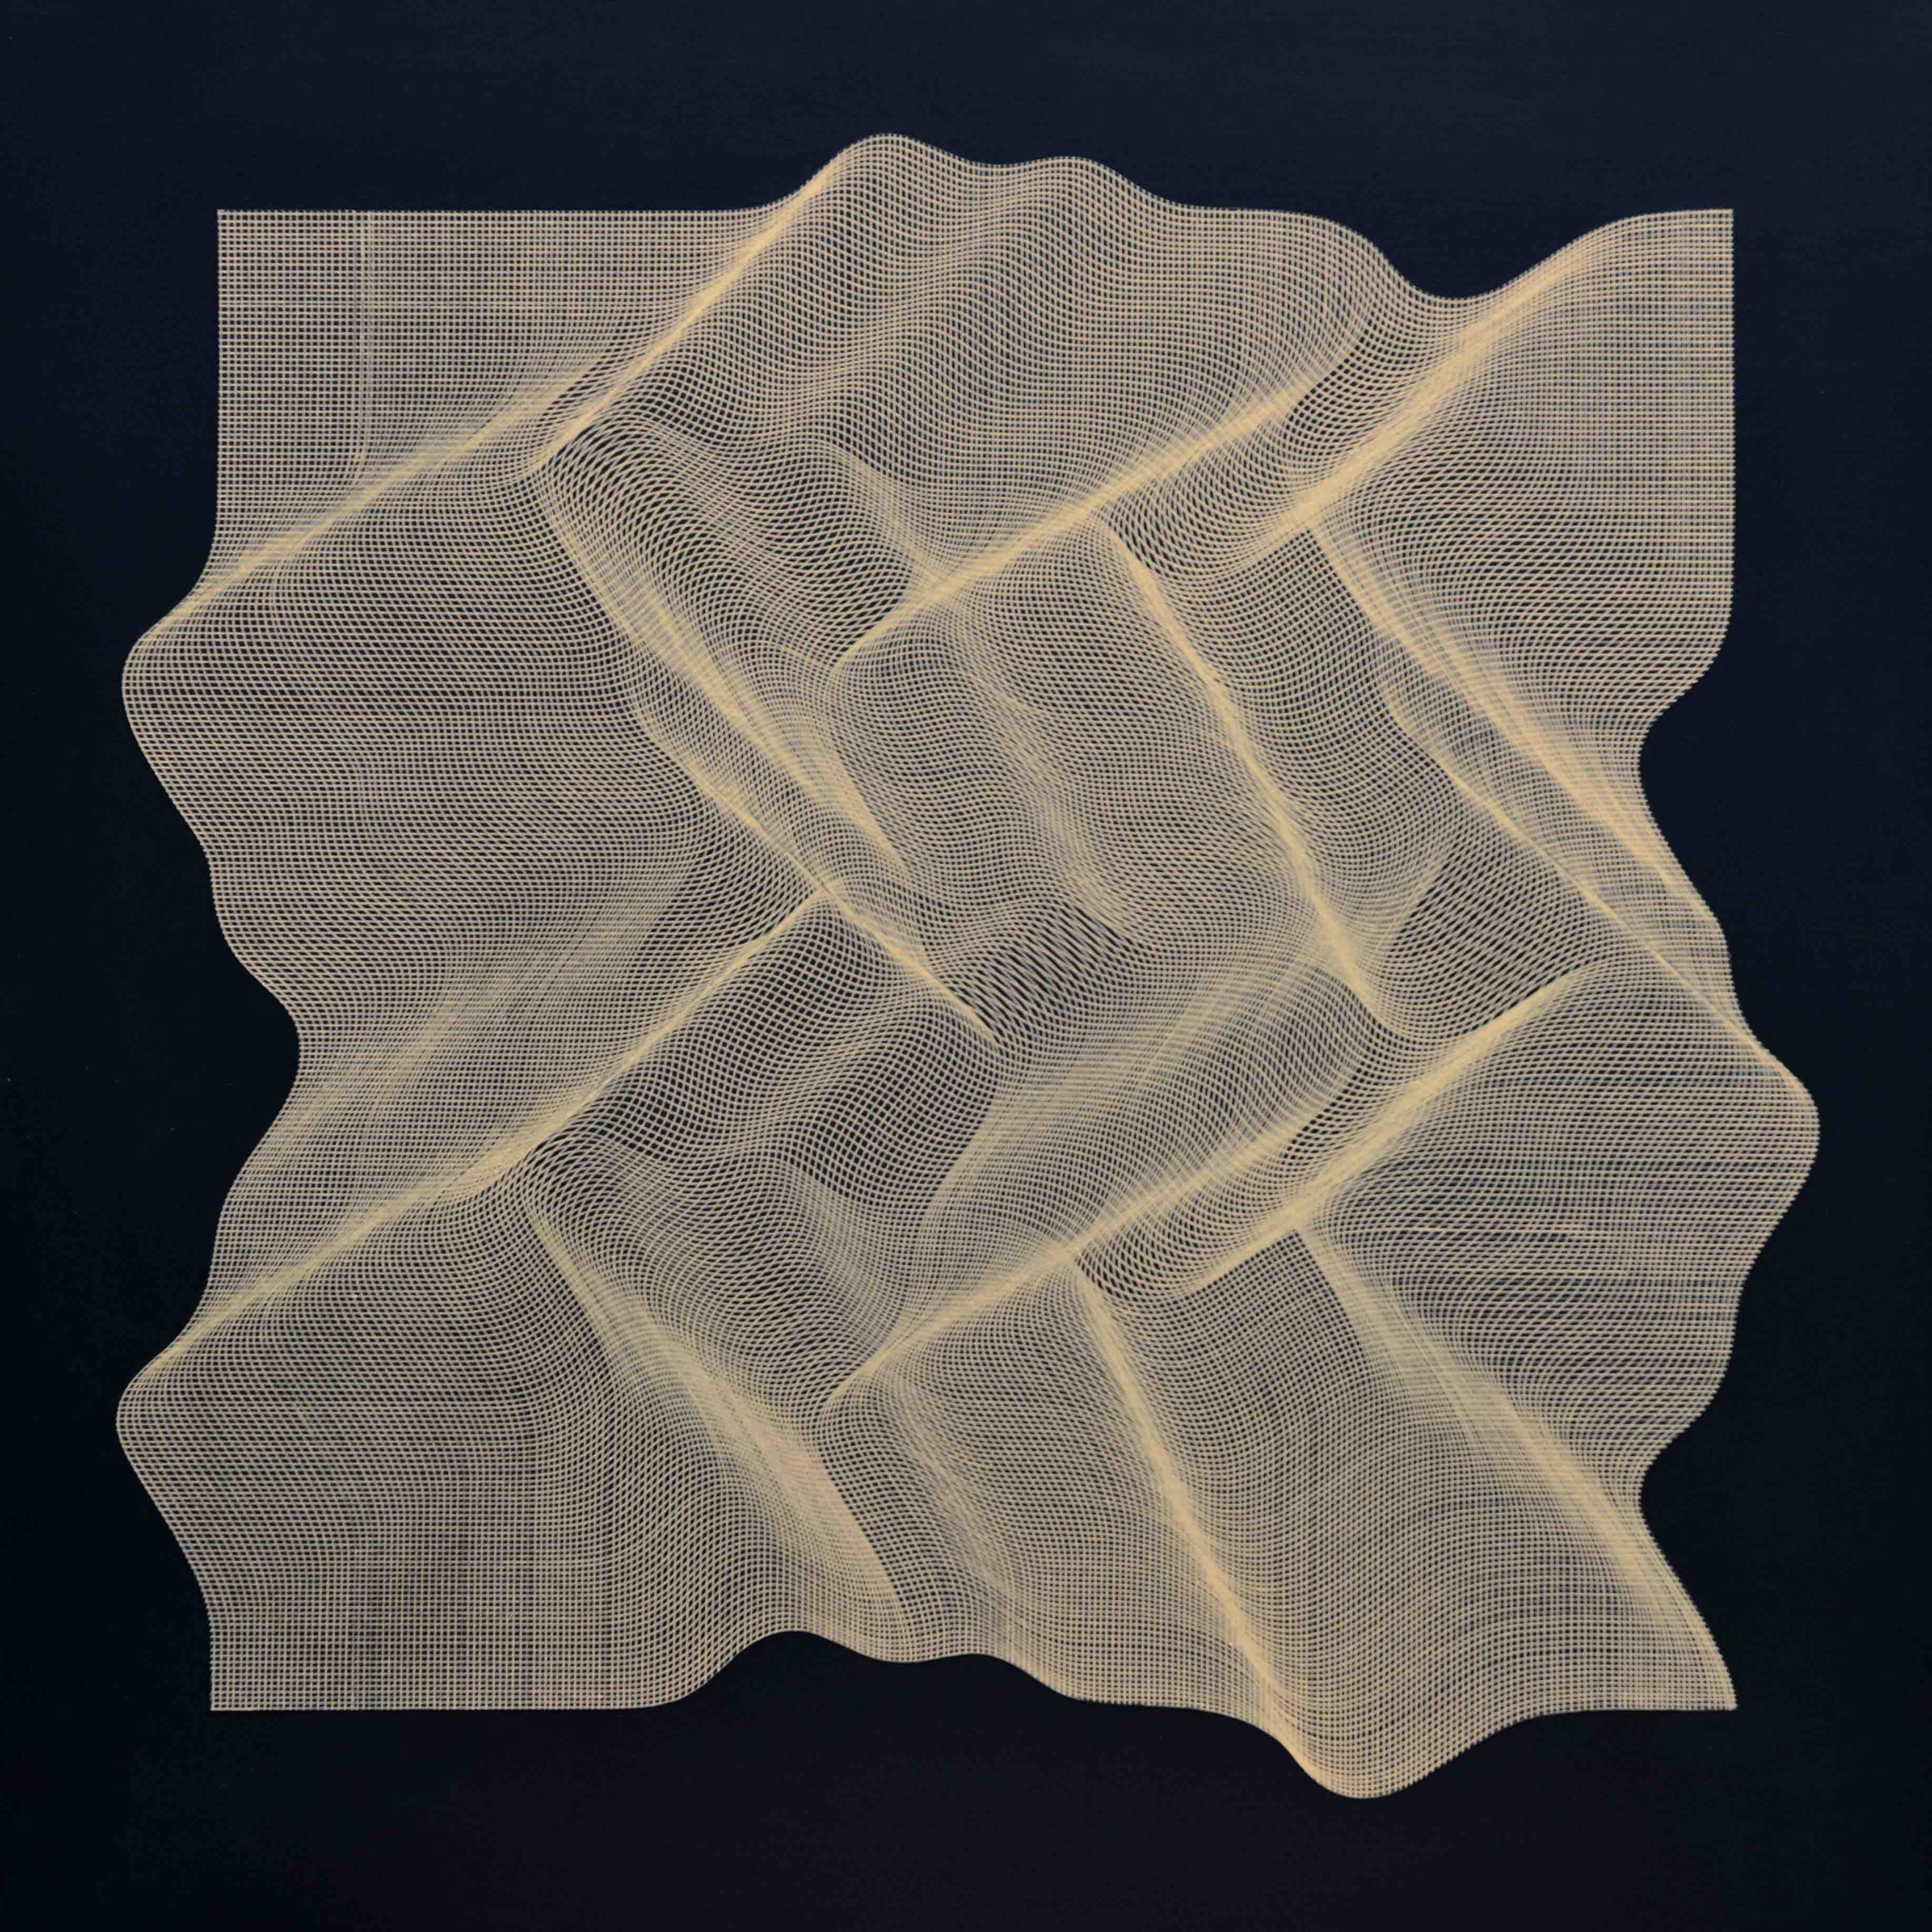 Texture Golden 2019 - Geometric Abstract